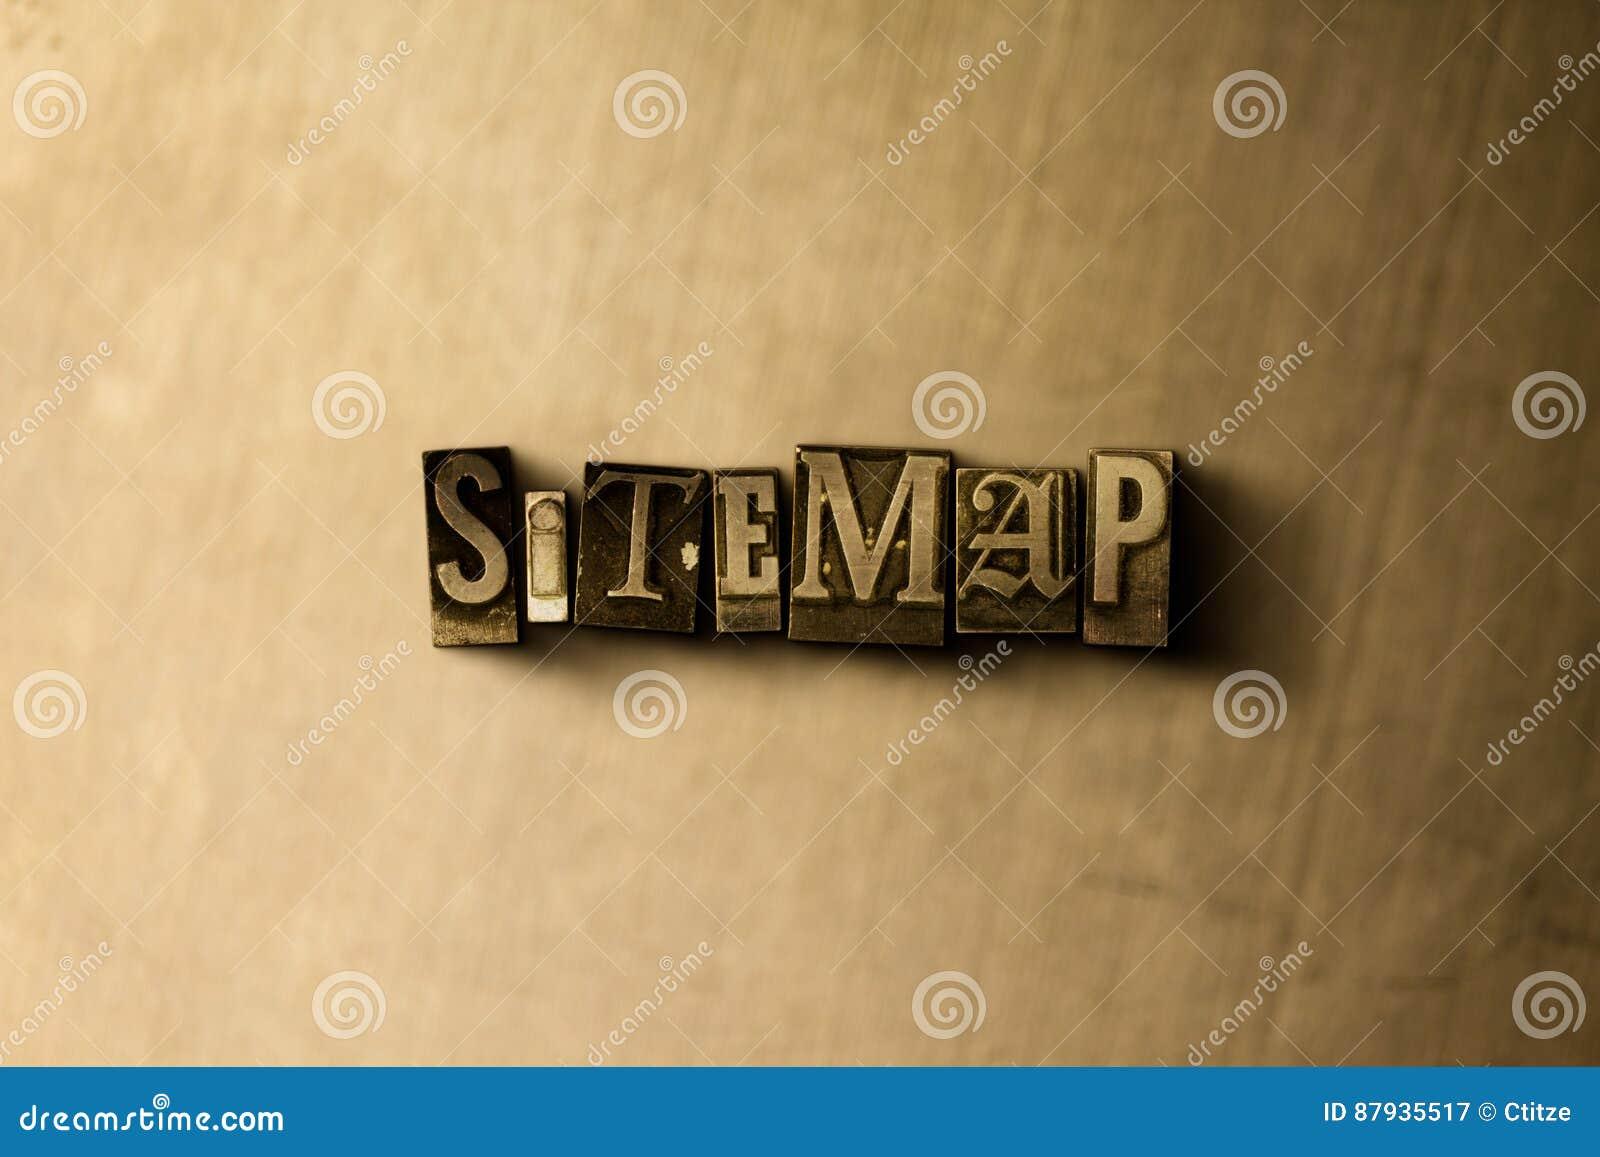 SITEMAP - close-up vintage sujo da palavra typeset no contexto do metal